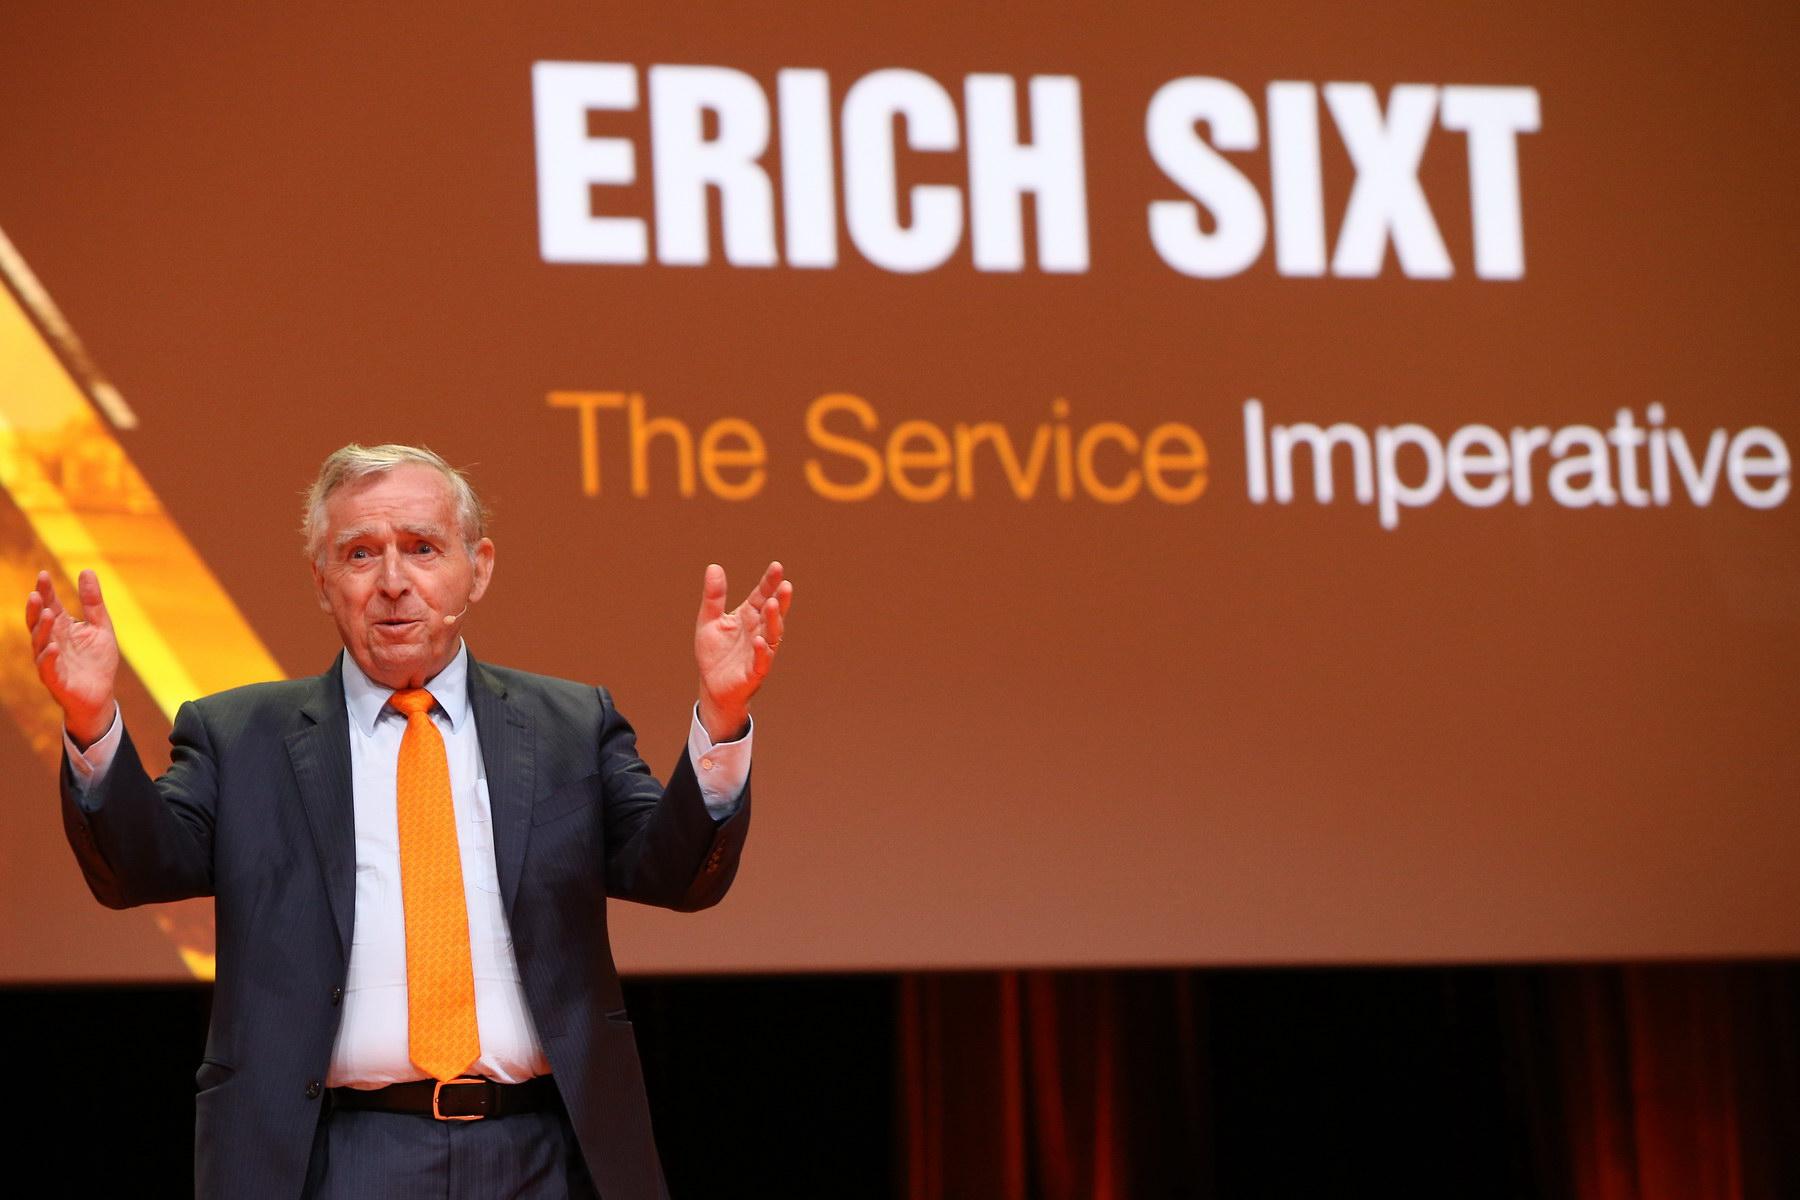 Erich Sixt